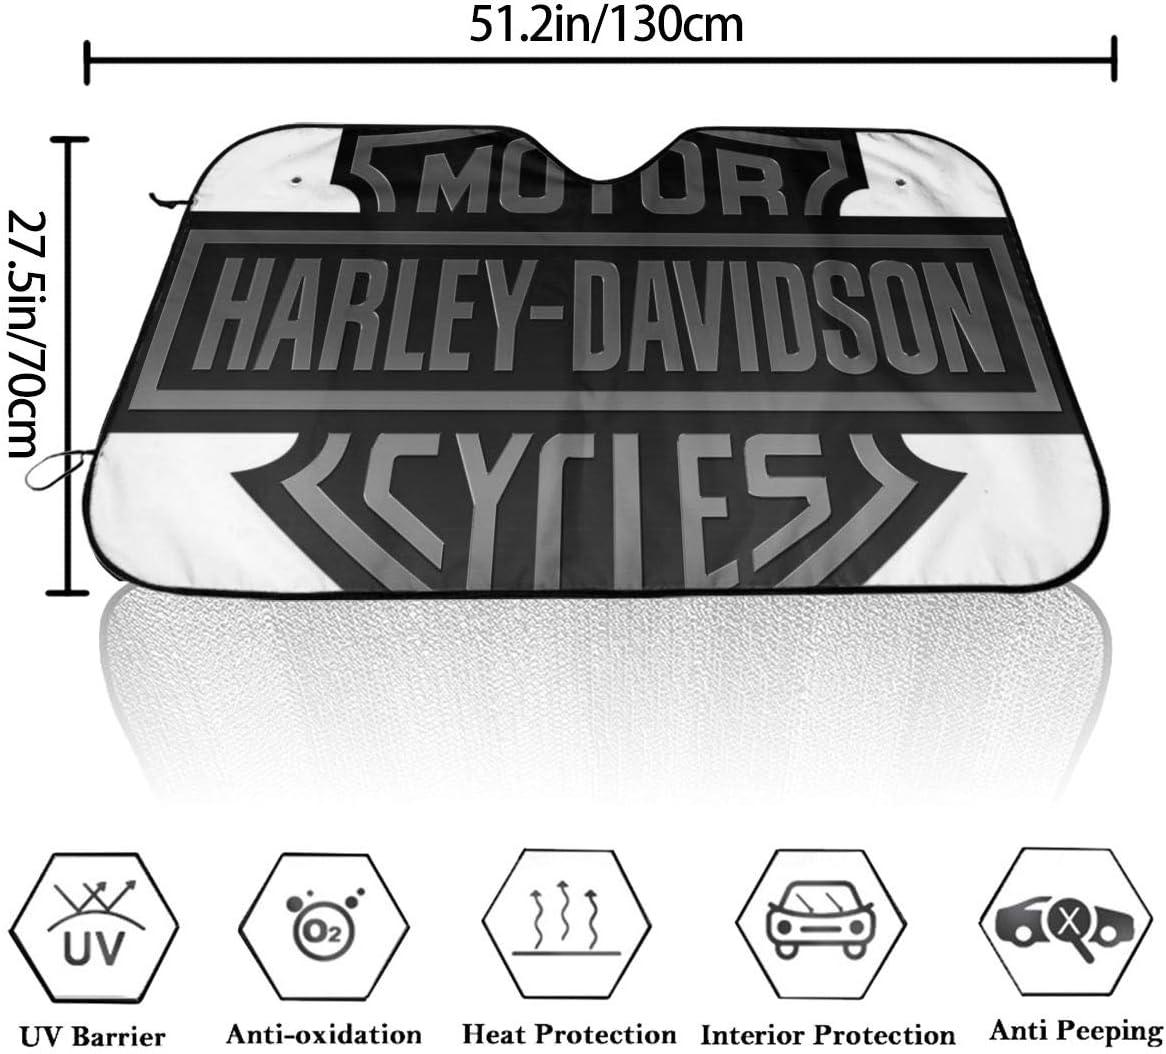 YF150 Parasole per Parabrezza Anteriore con Logo Harley Davidson